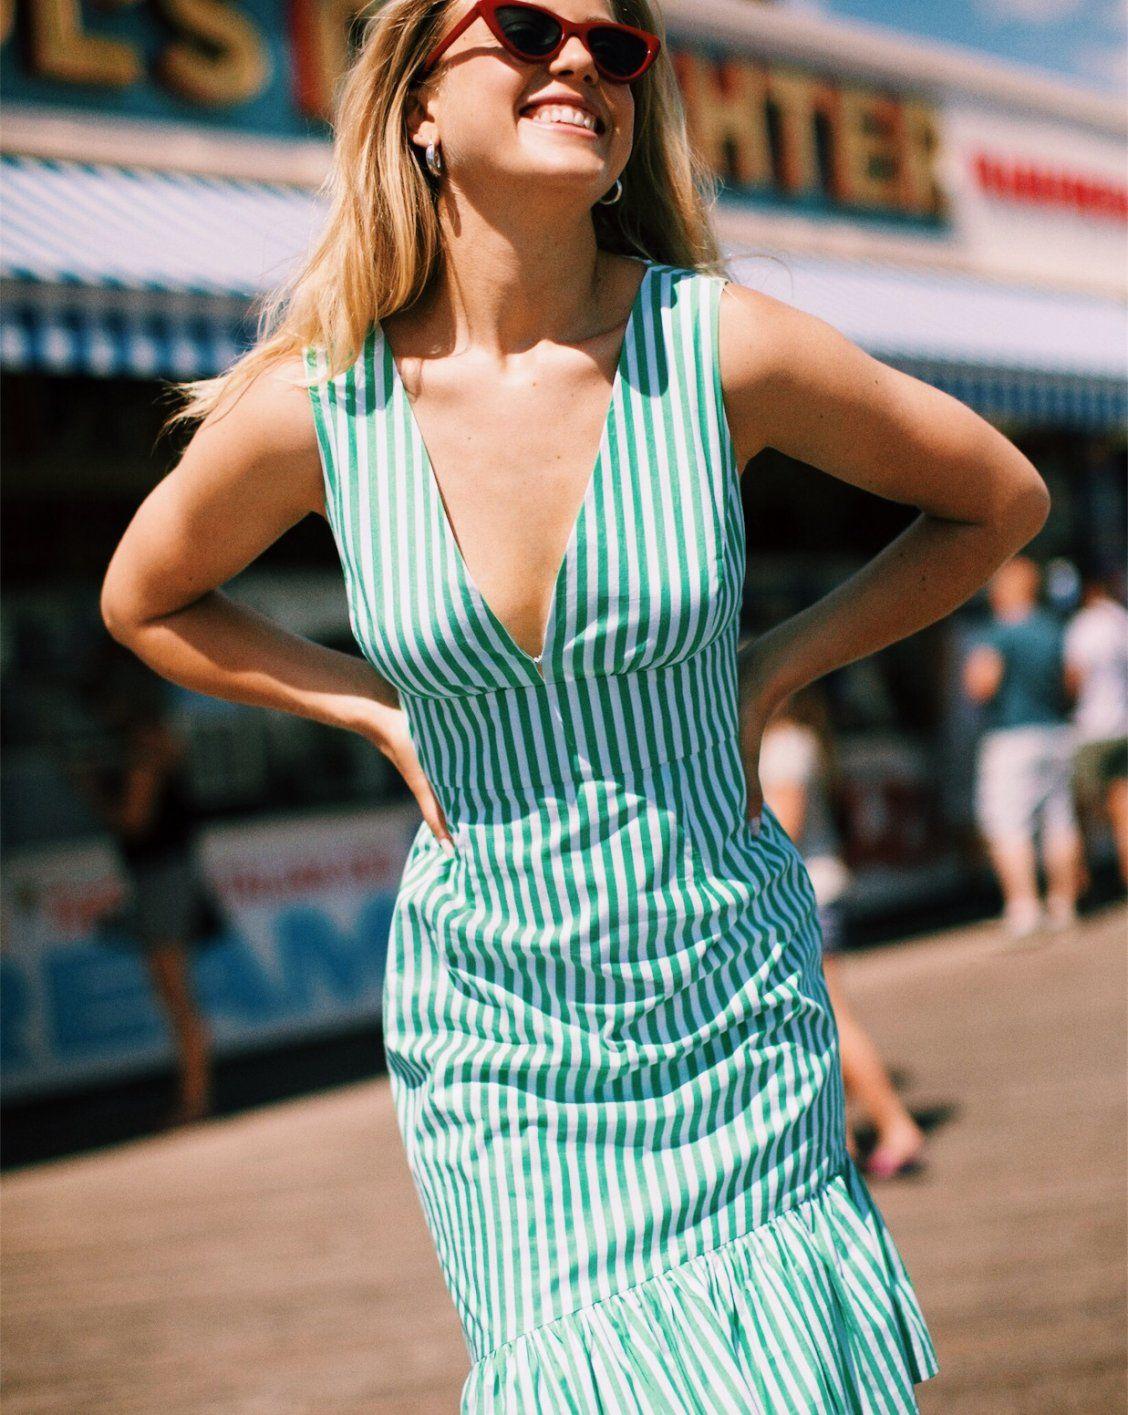 d12cbed2e9b0c Assateague Striped Dress in 2019 | Maxi & Midi Dresses | Dresses ...